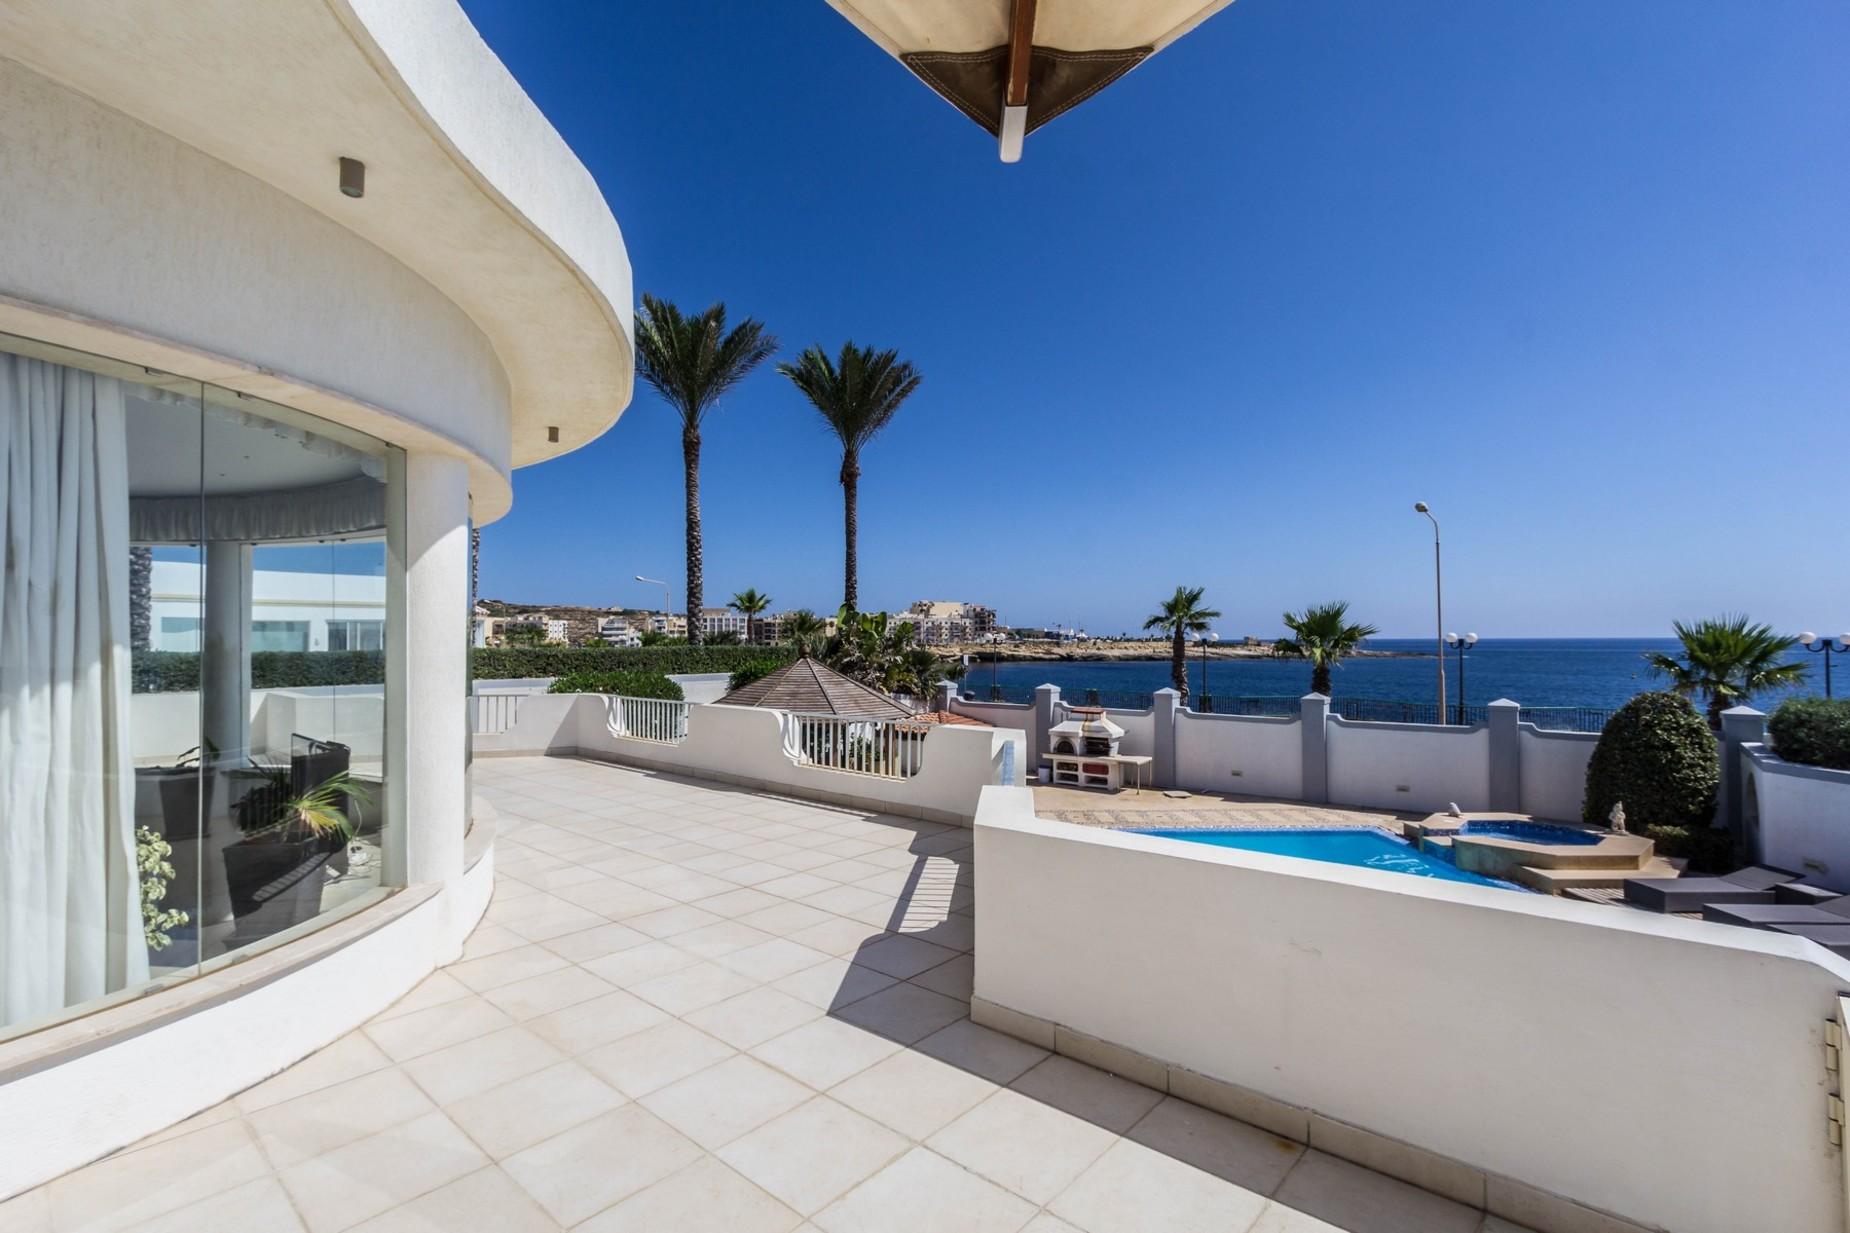 3 bed Villa For Sale in Marsascala, Marsascala - thumb 4